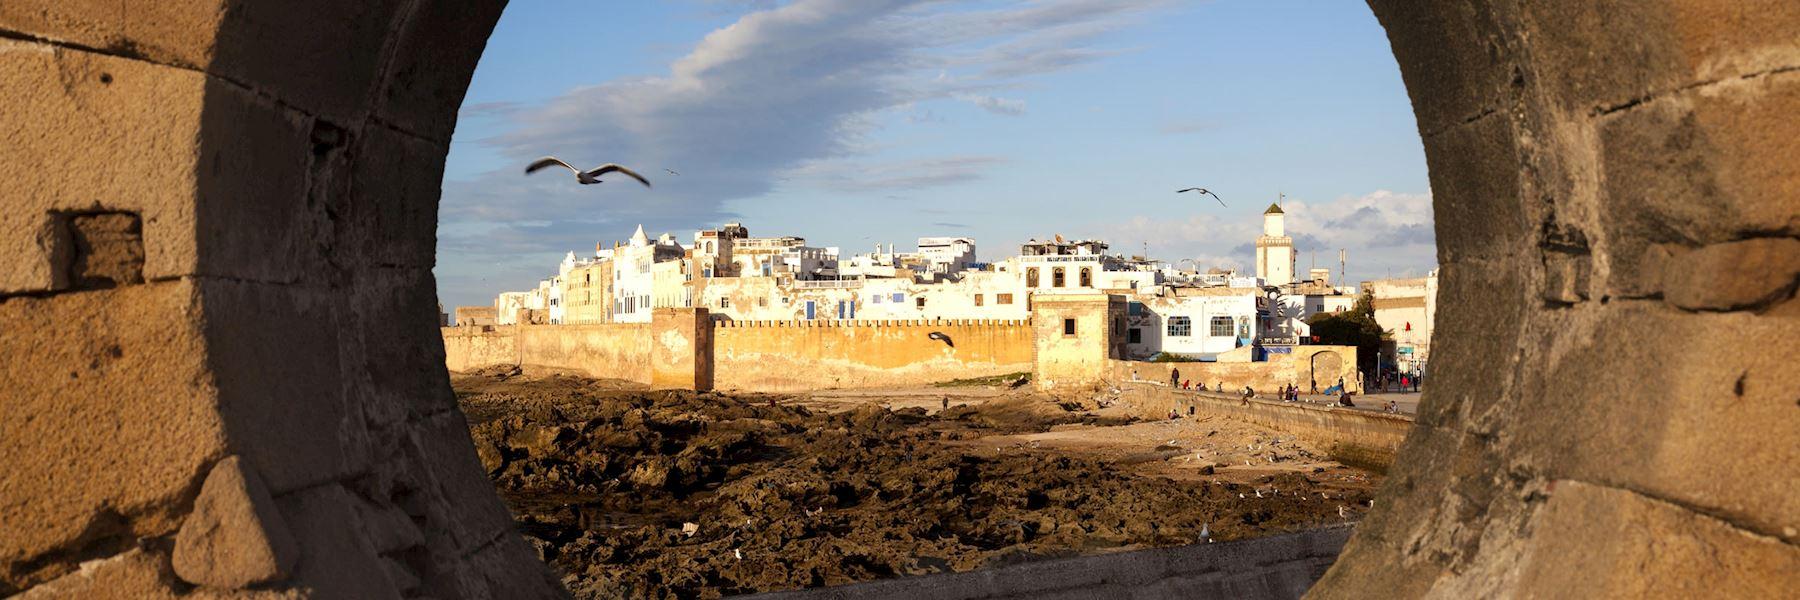 Visit Essaouira, Morocco